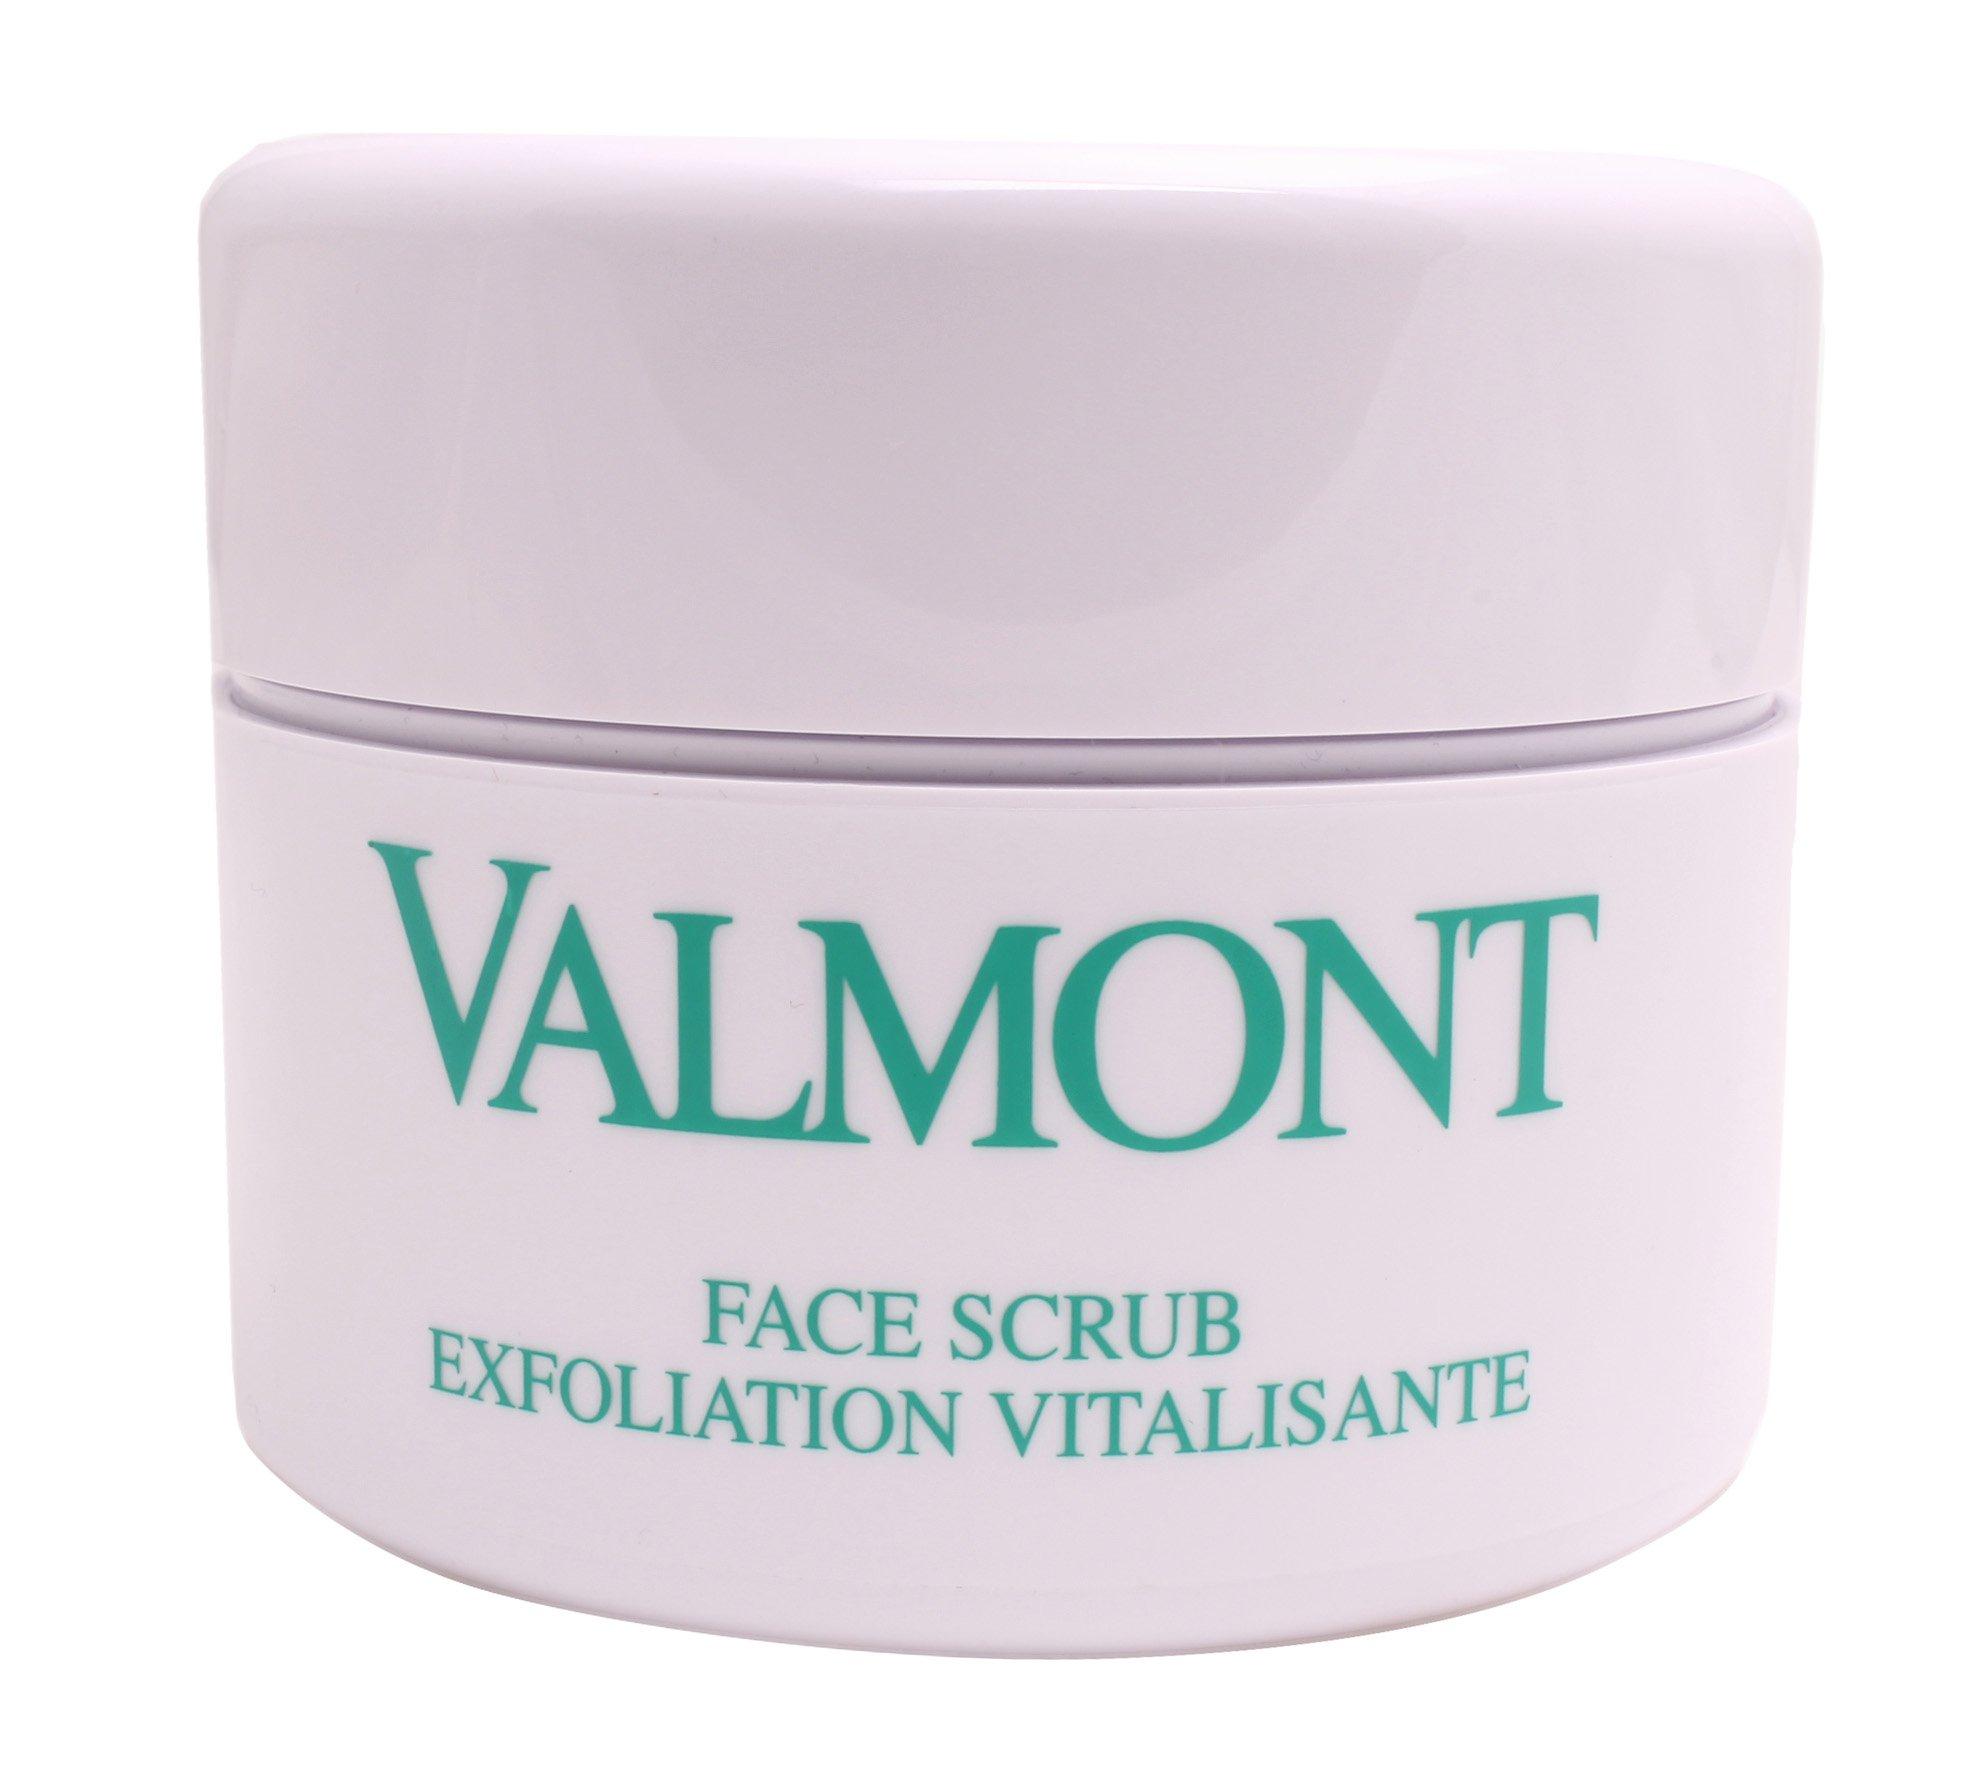 Valmont Face Scrub, 7.0 Ounce